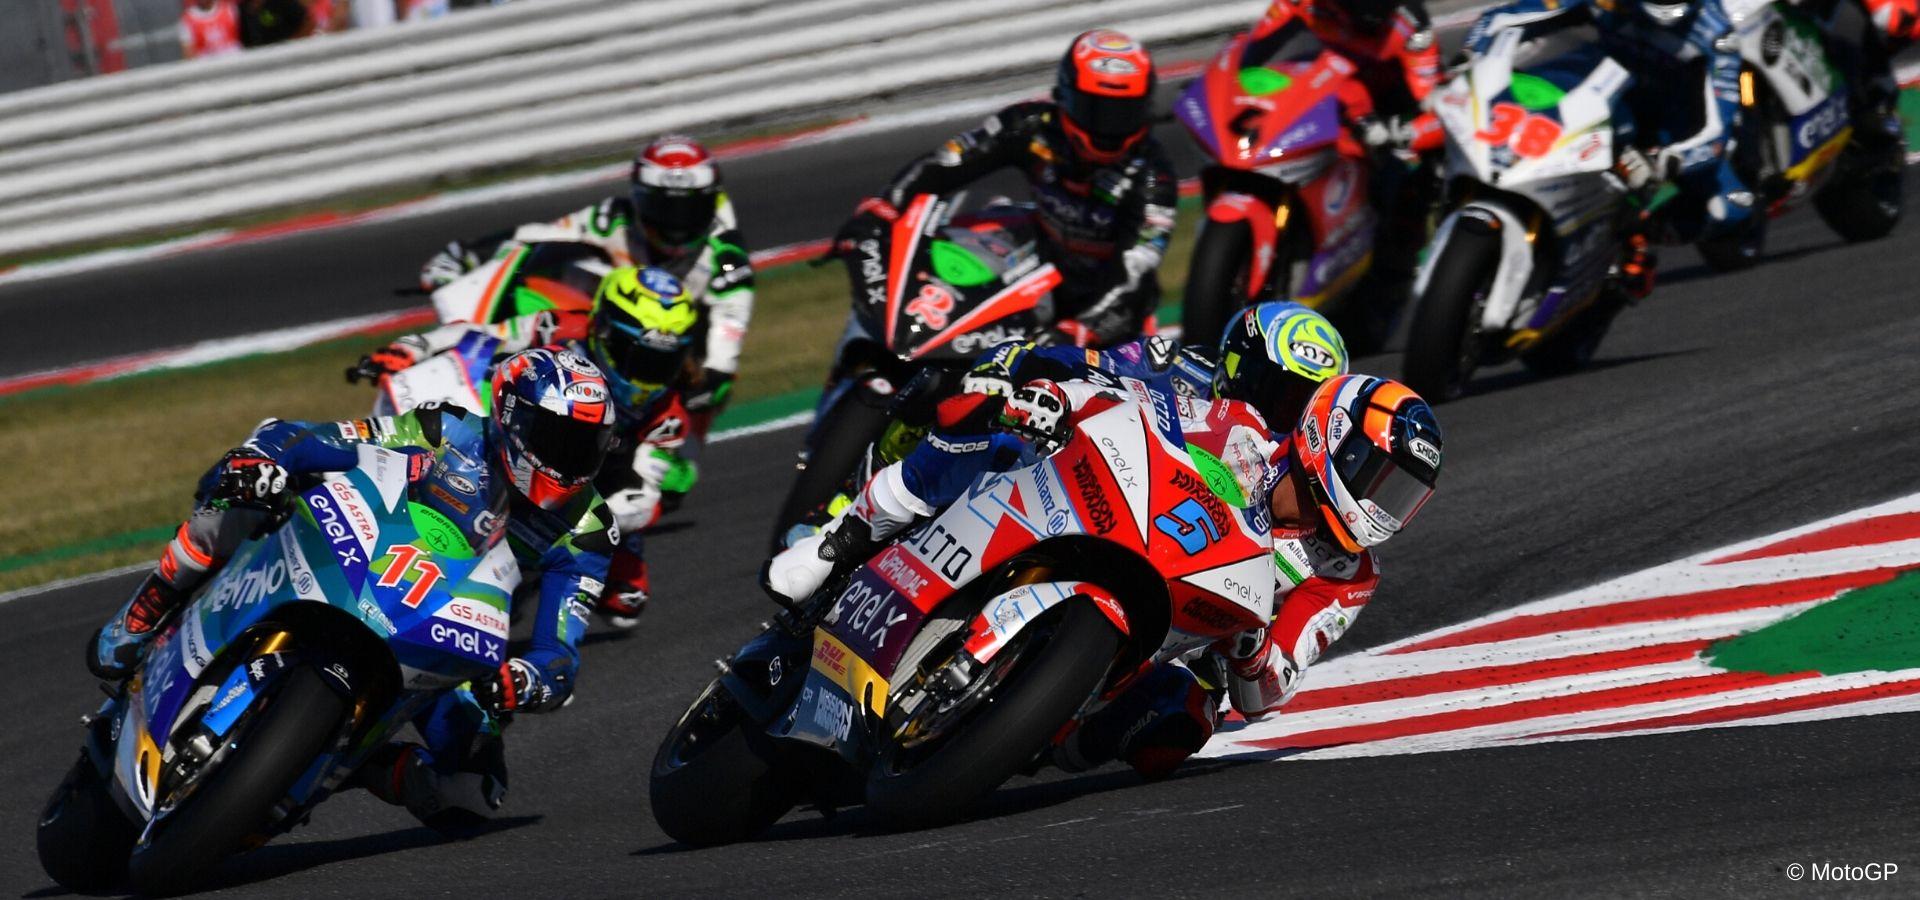 La MotoE insieme alla MotoGP nella Virtual Race 4 a Misano